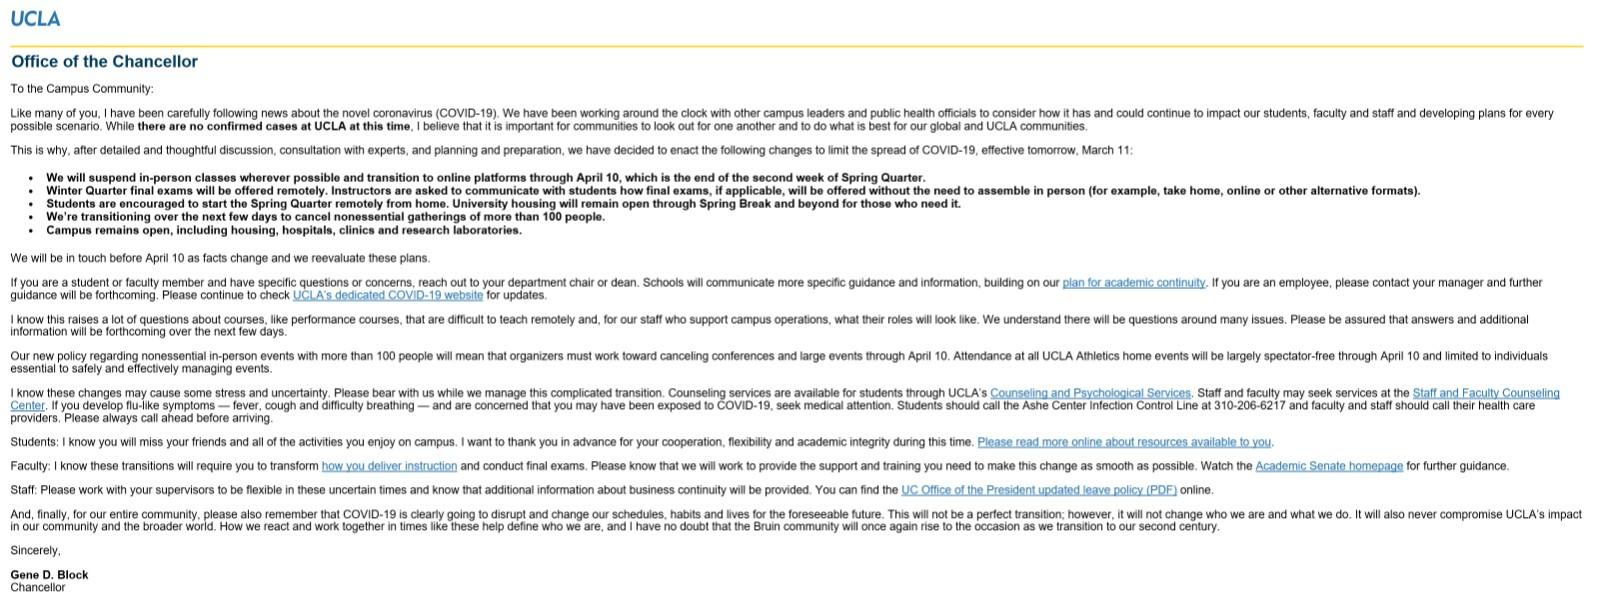 UCLA、USC 周三起停课改为网上授课_图1-4